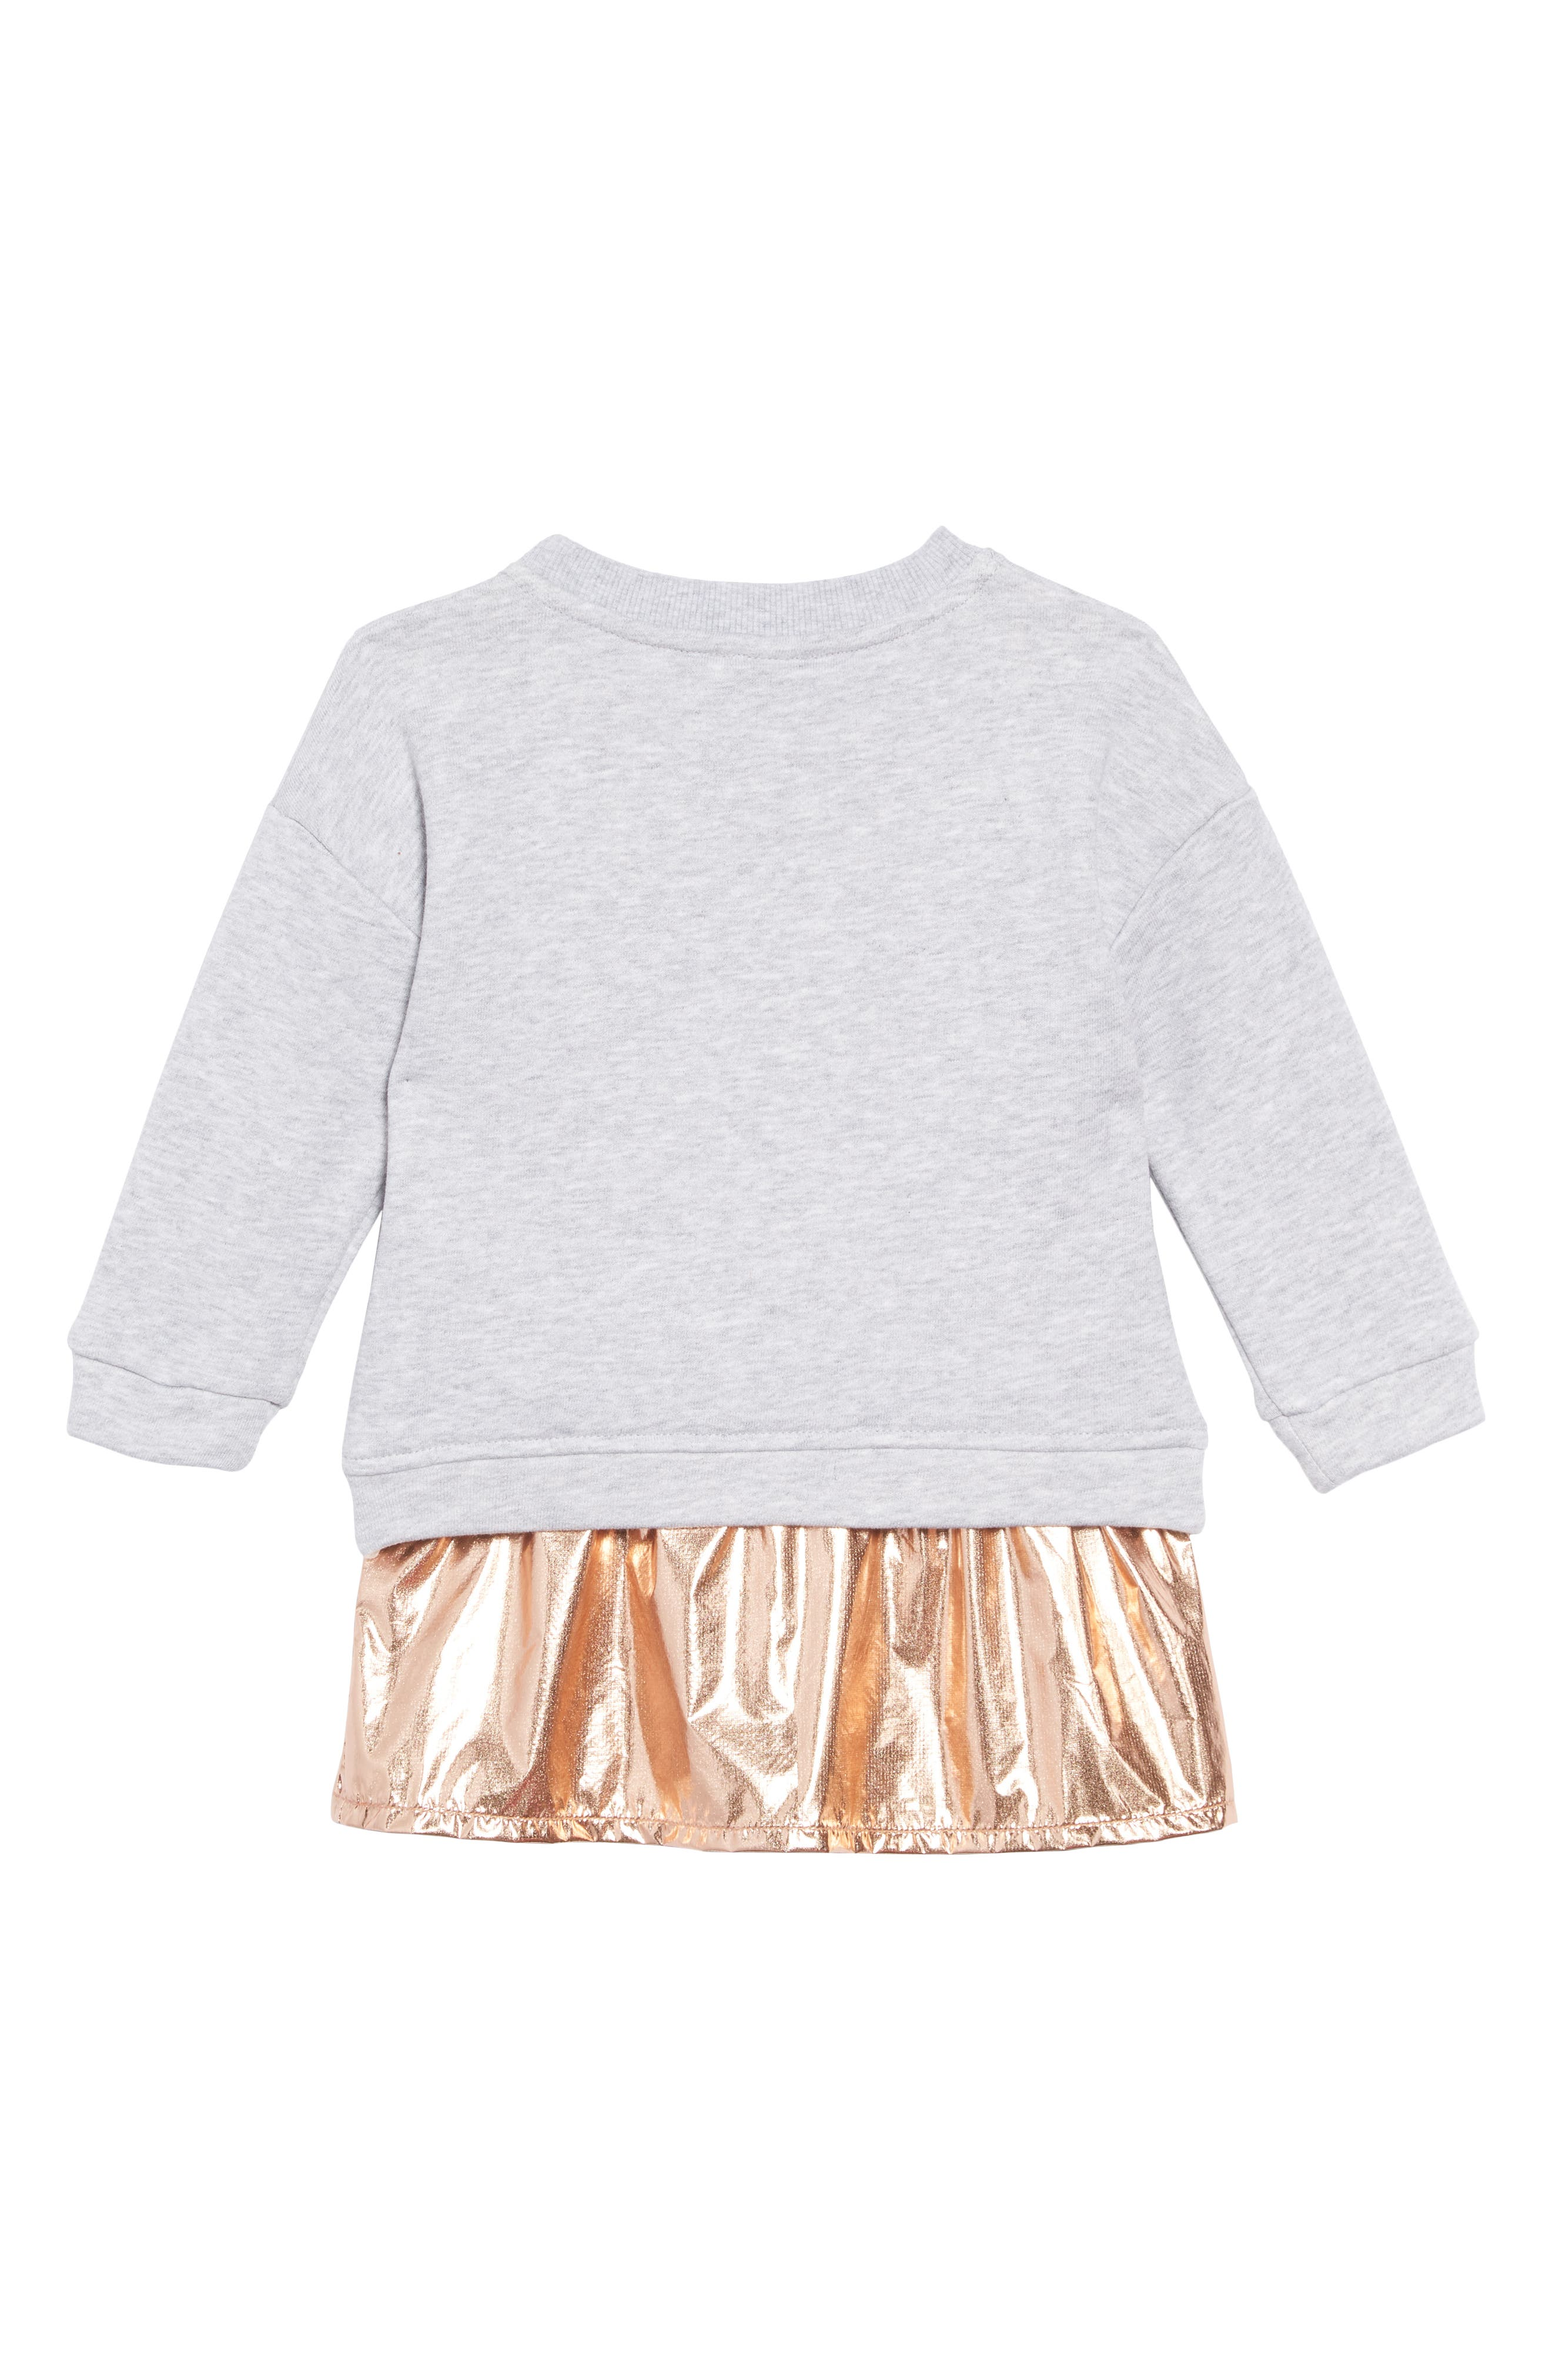 KENZO, Metallic Graphic Sweatshirt & Dress Set, Alternate thumbnail 2, color, COPPER